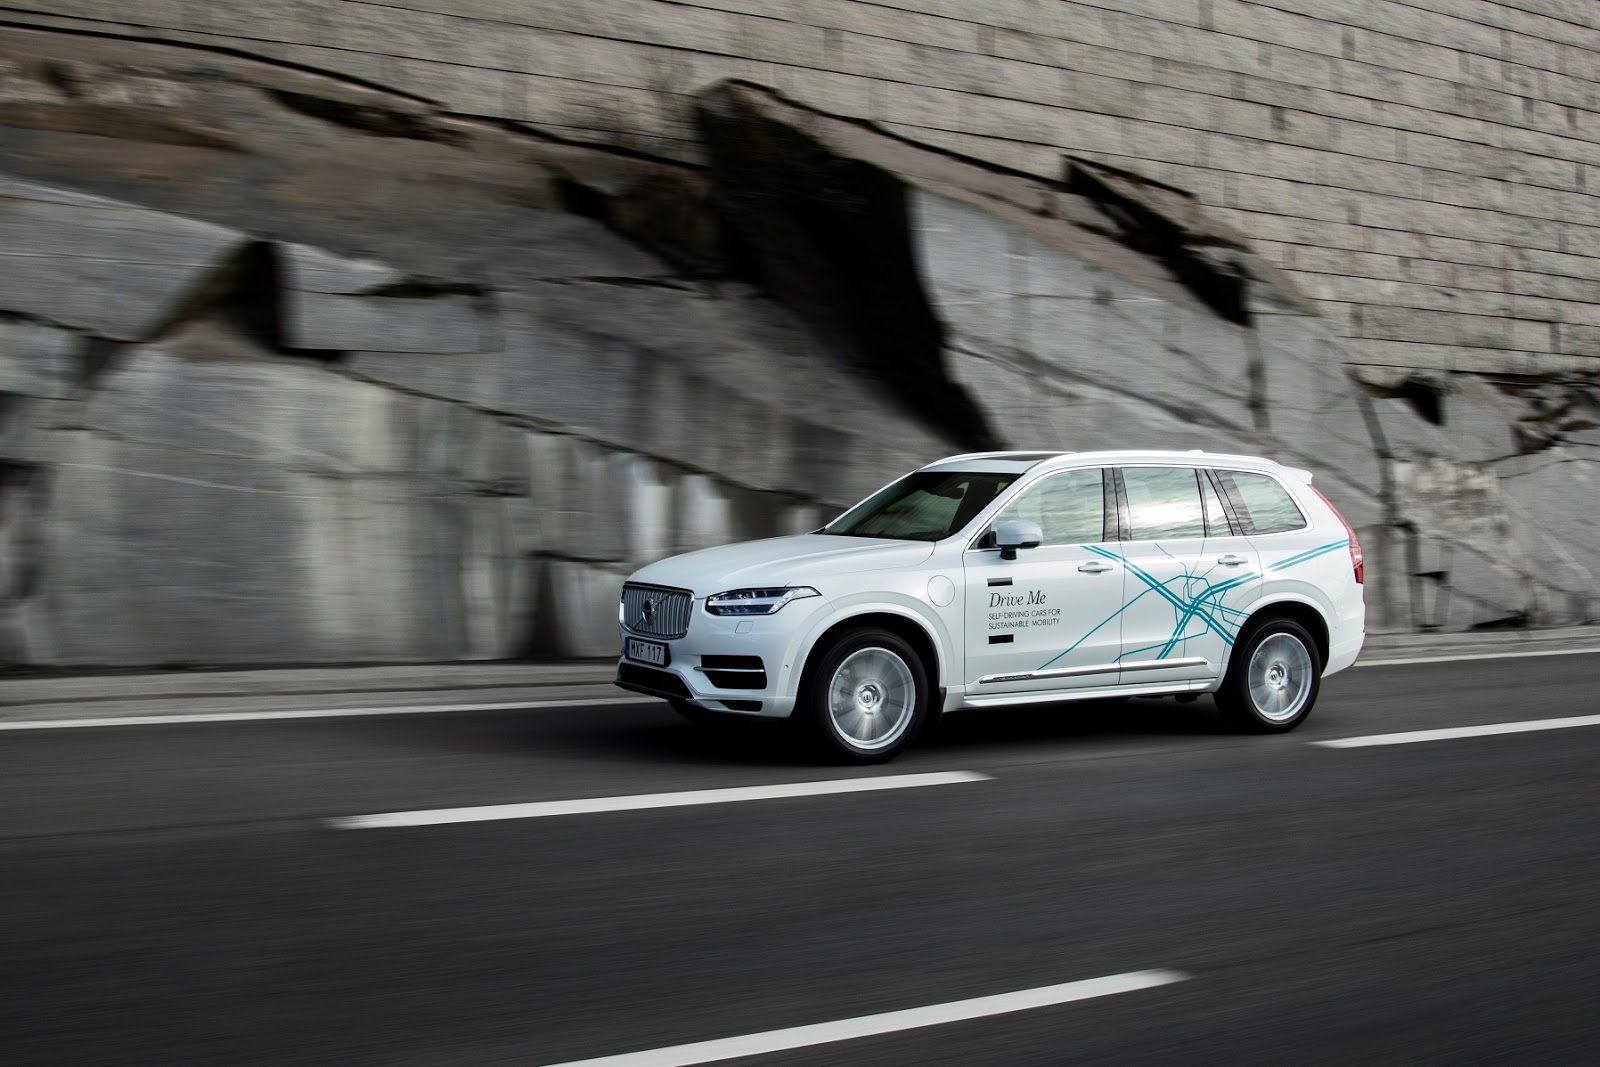 VOLVO DRIVE ME2BLONDON 3 Αυτόνομη οδήγηση από τη Volvo και στη Μεγ. Βρετανία Autonomous Driving, videos, Volvo, Volvo Cars, Τεχνολογία